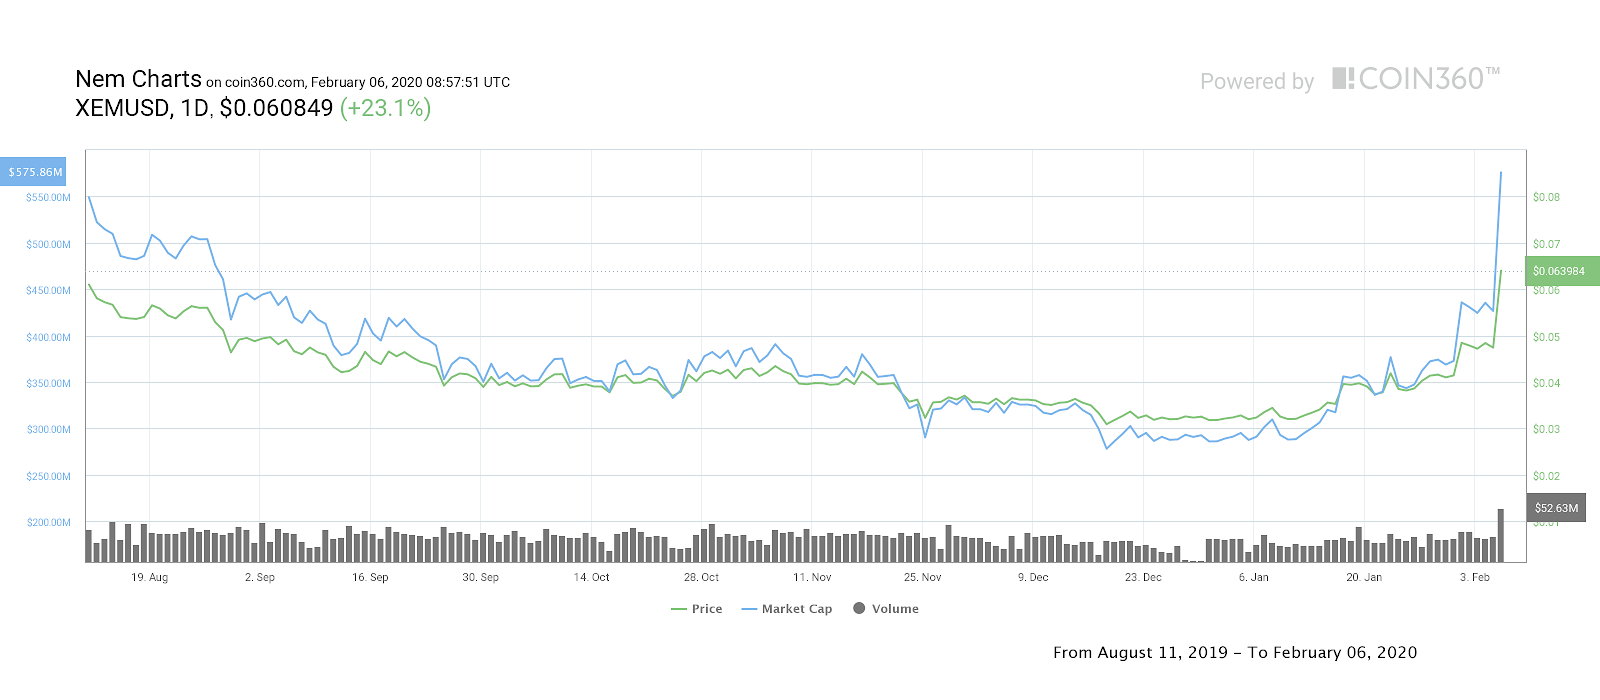 NEM 6-month price chart